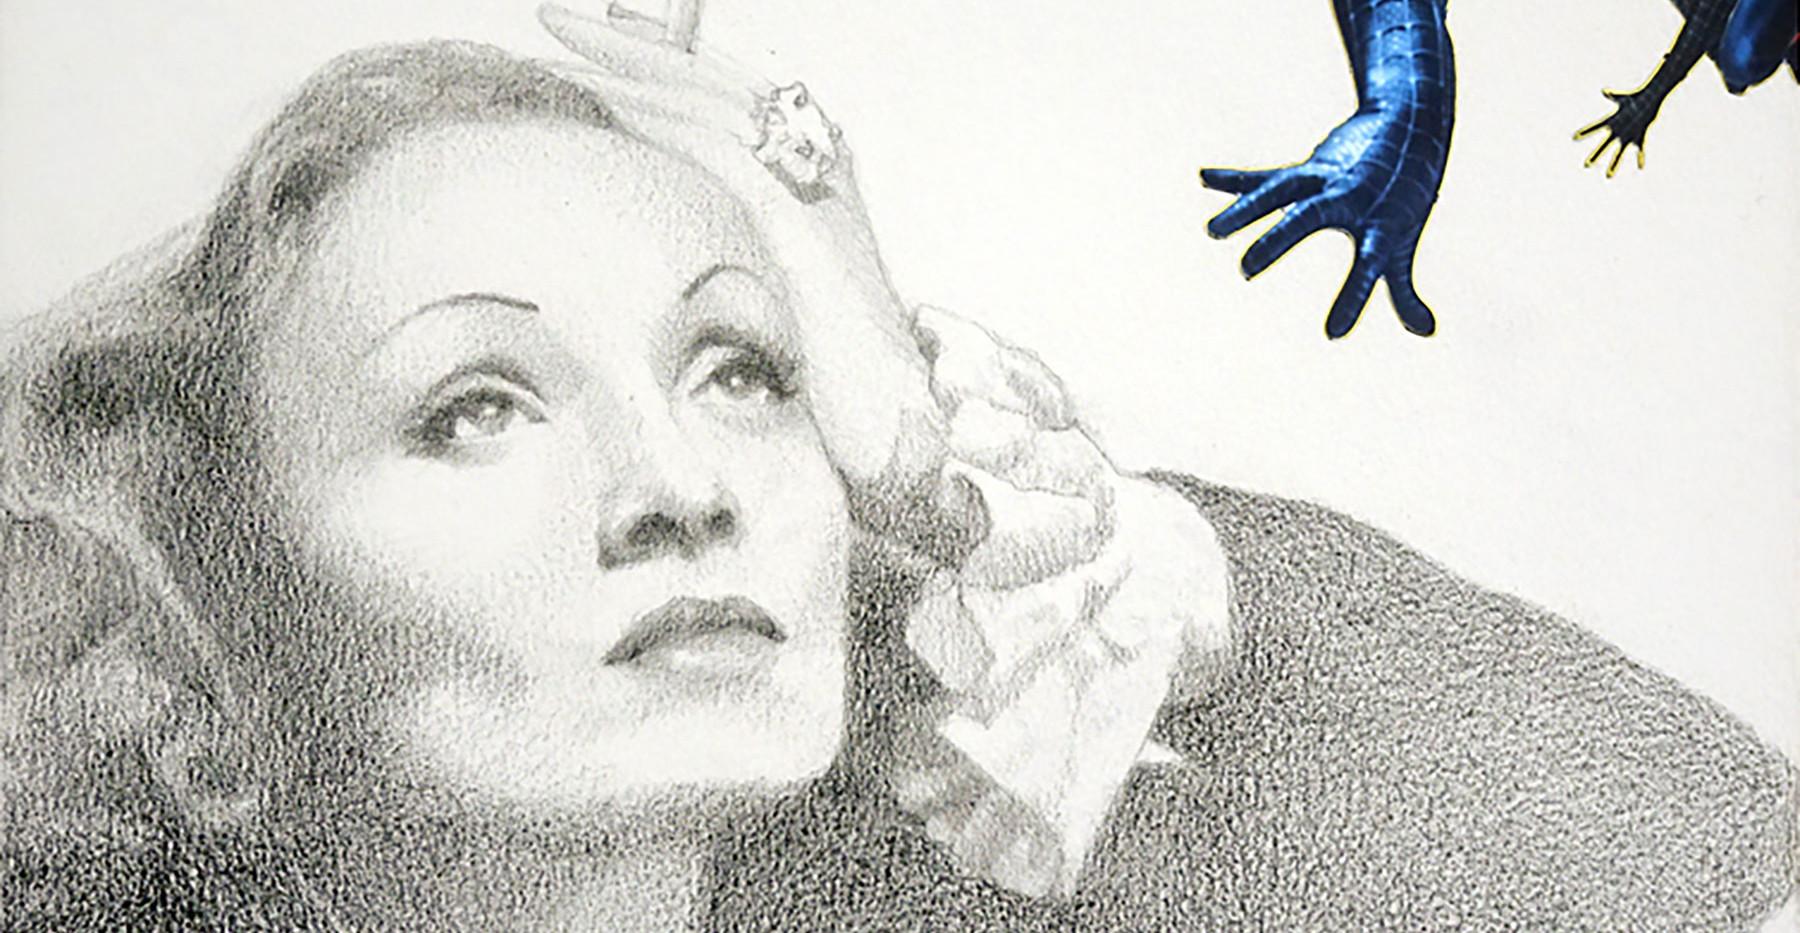 marlene-lapiz-y-collage-sobre-papel-25x2